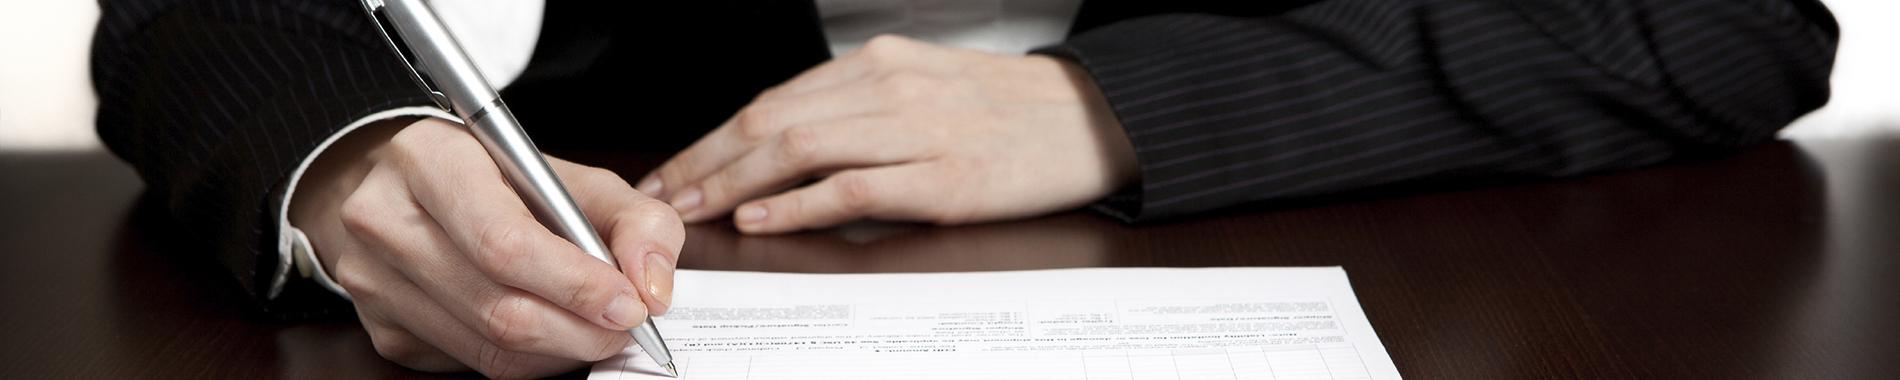 Applying for a job following a dismissal